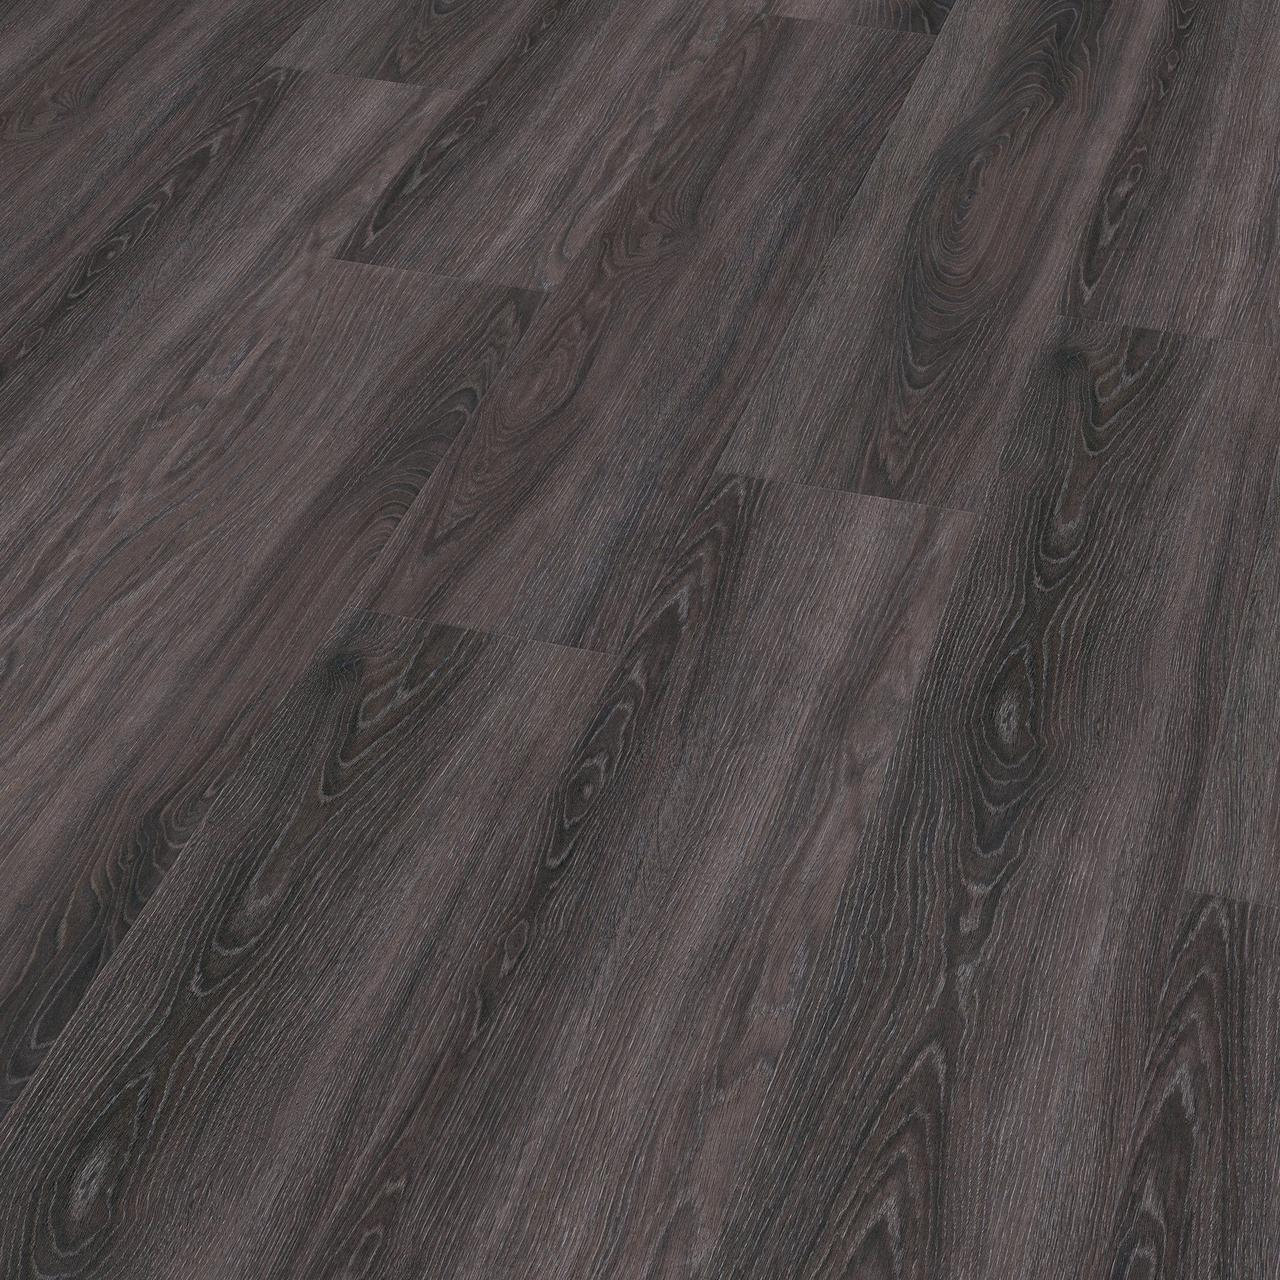 Виниловые покрытия  Wineo Miracle Oak Dry